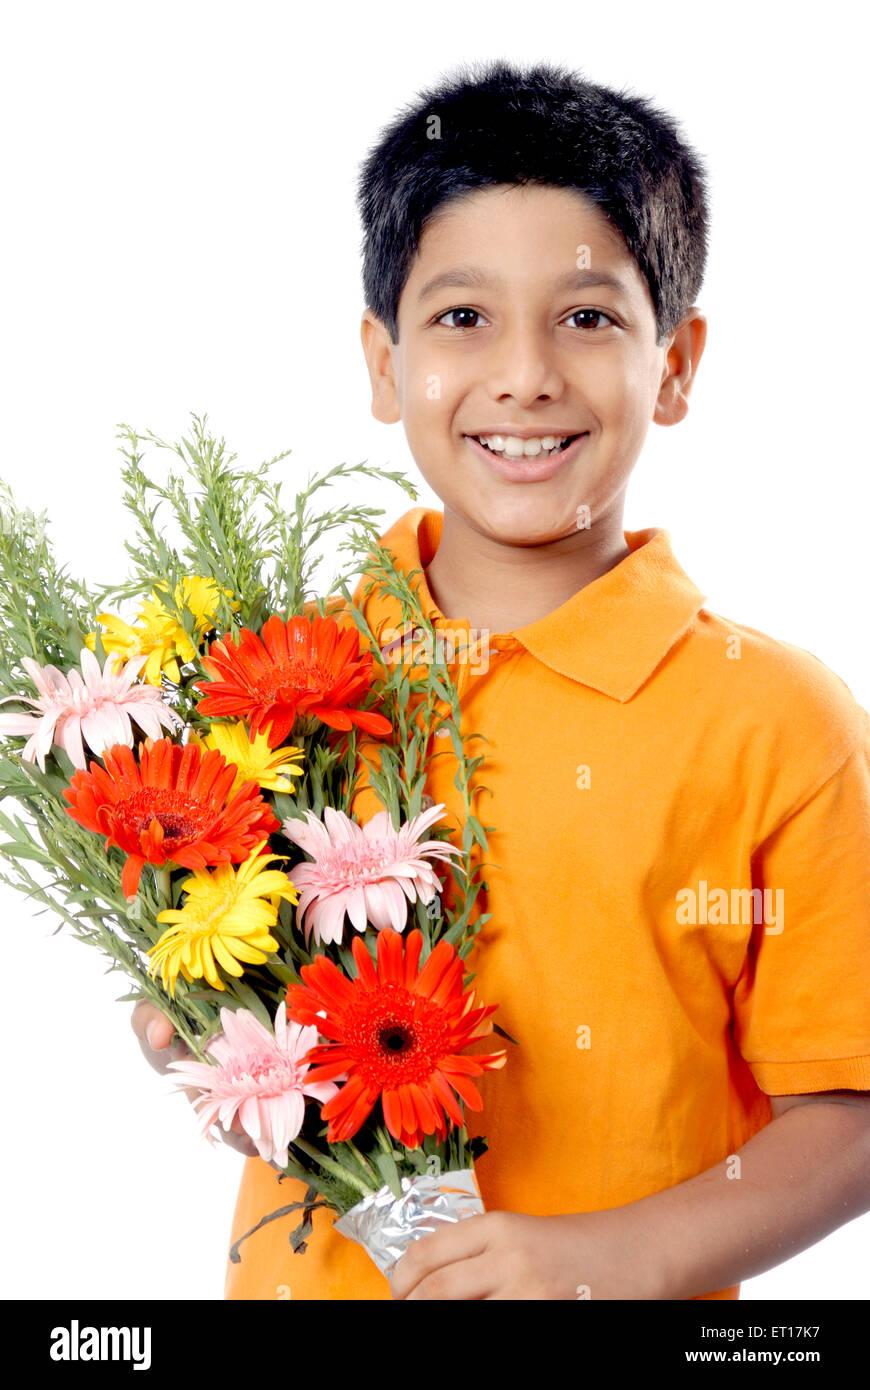 Boy holding flower bouquet MR#152 - Stock Image